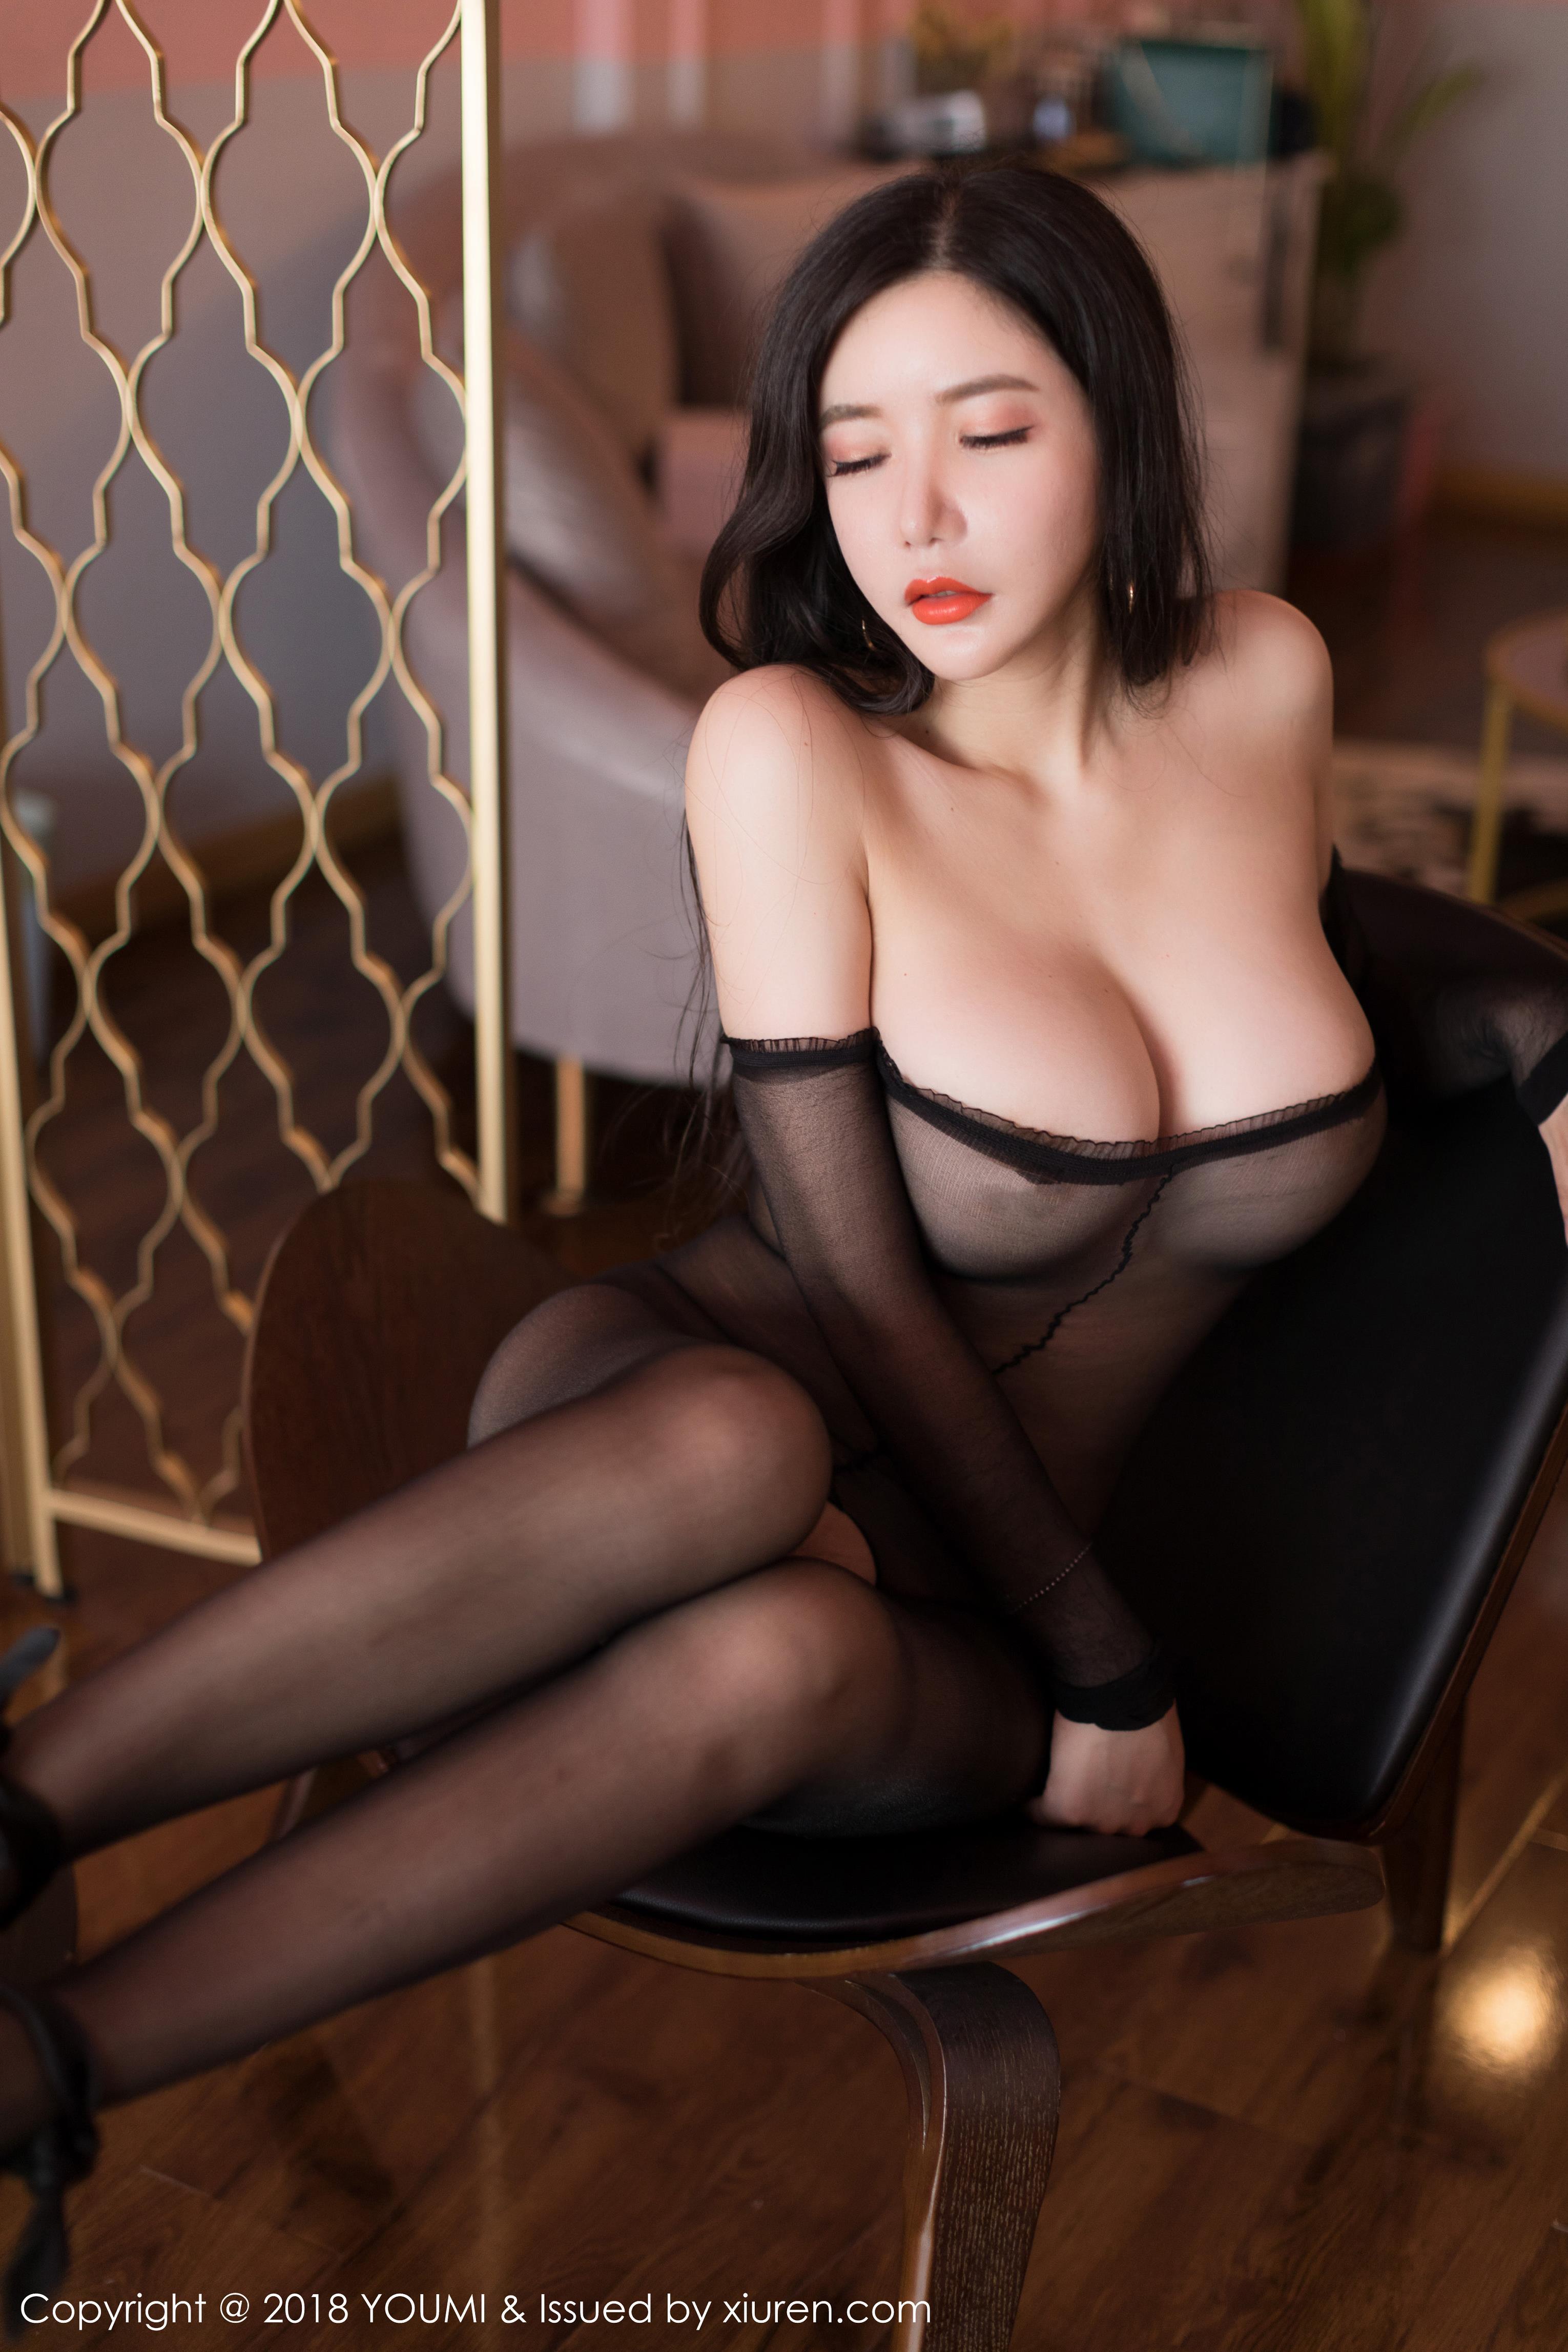 [YOUMI尤蜜荟]YMH20180918VOL0214 心妍小公主 黑色连体开裆丝袜性感私房写真集